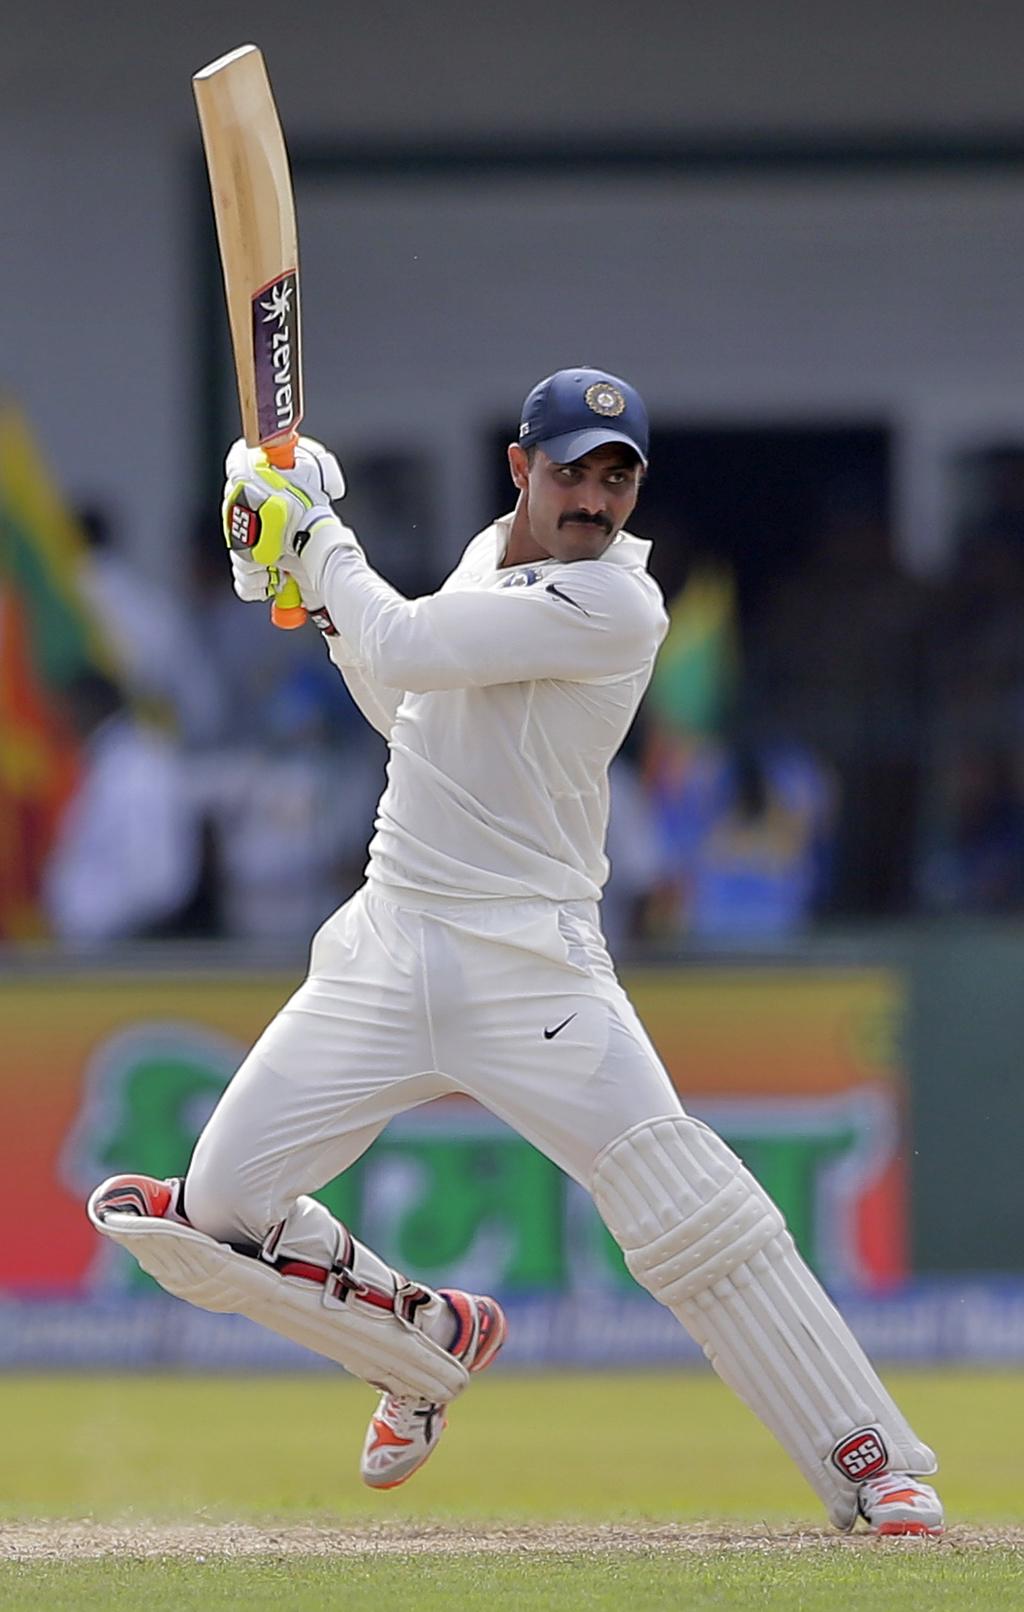 India's Ravindra Jadeja watches his shot during their second cricket test match against Sri Lanka in Colombo, Sri Lanka, Friday, Aug. 4, 2017. (AP Pho...